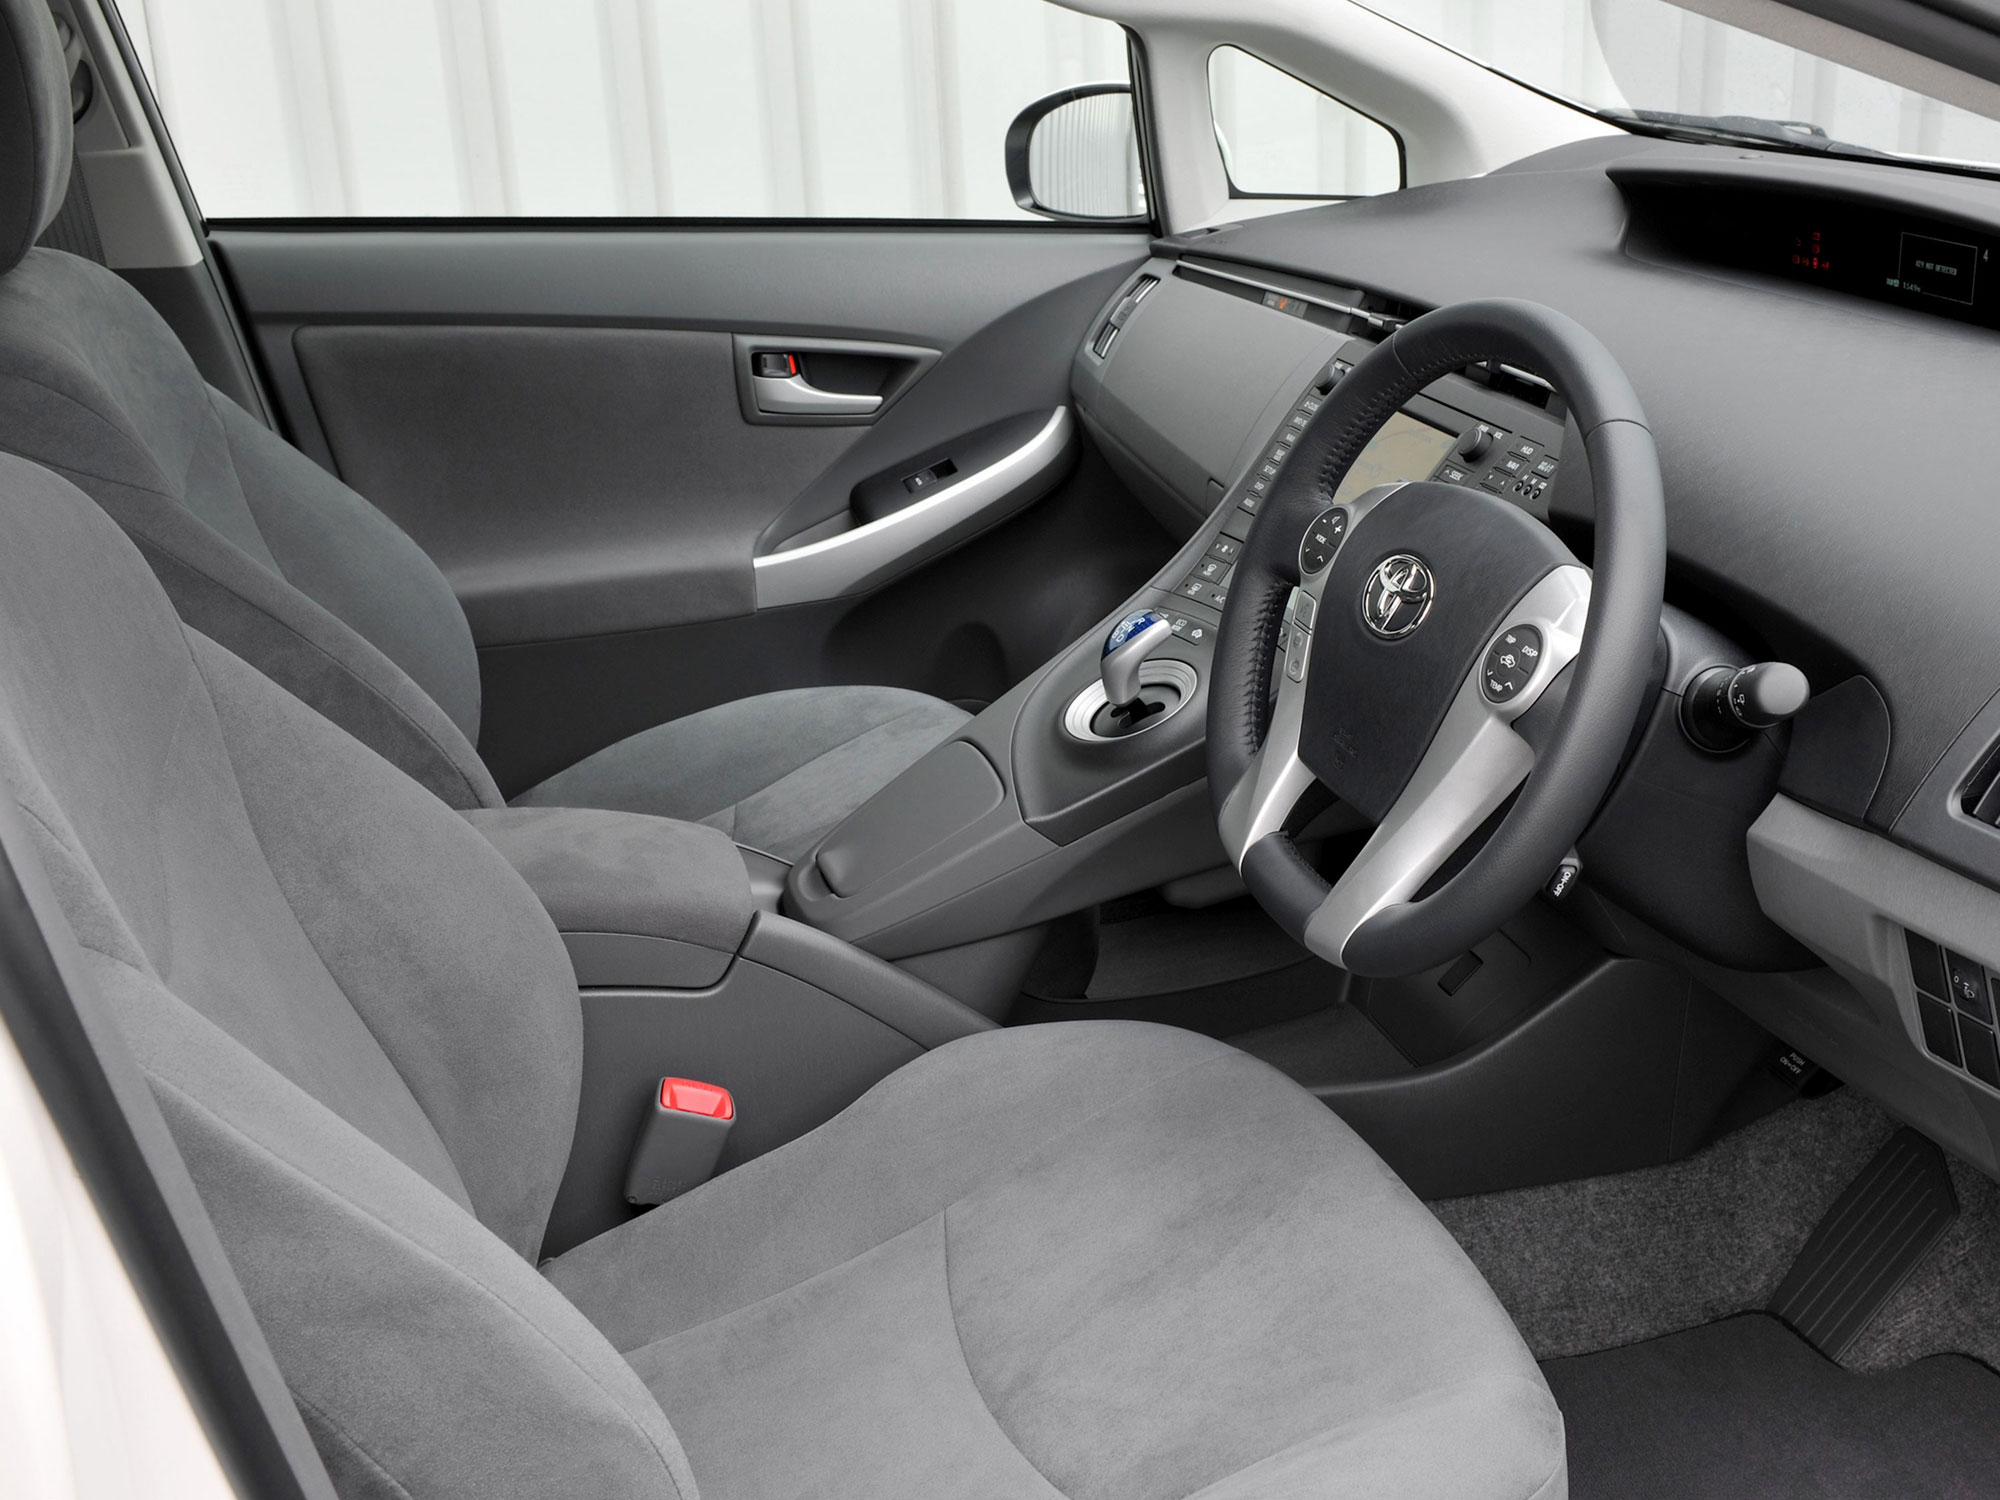 Toyota-Prius-Mk3-11.jpg